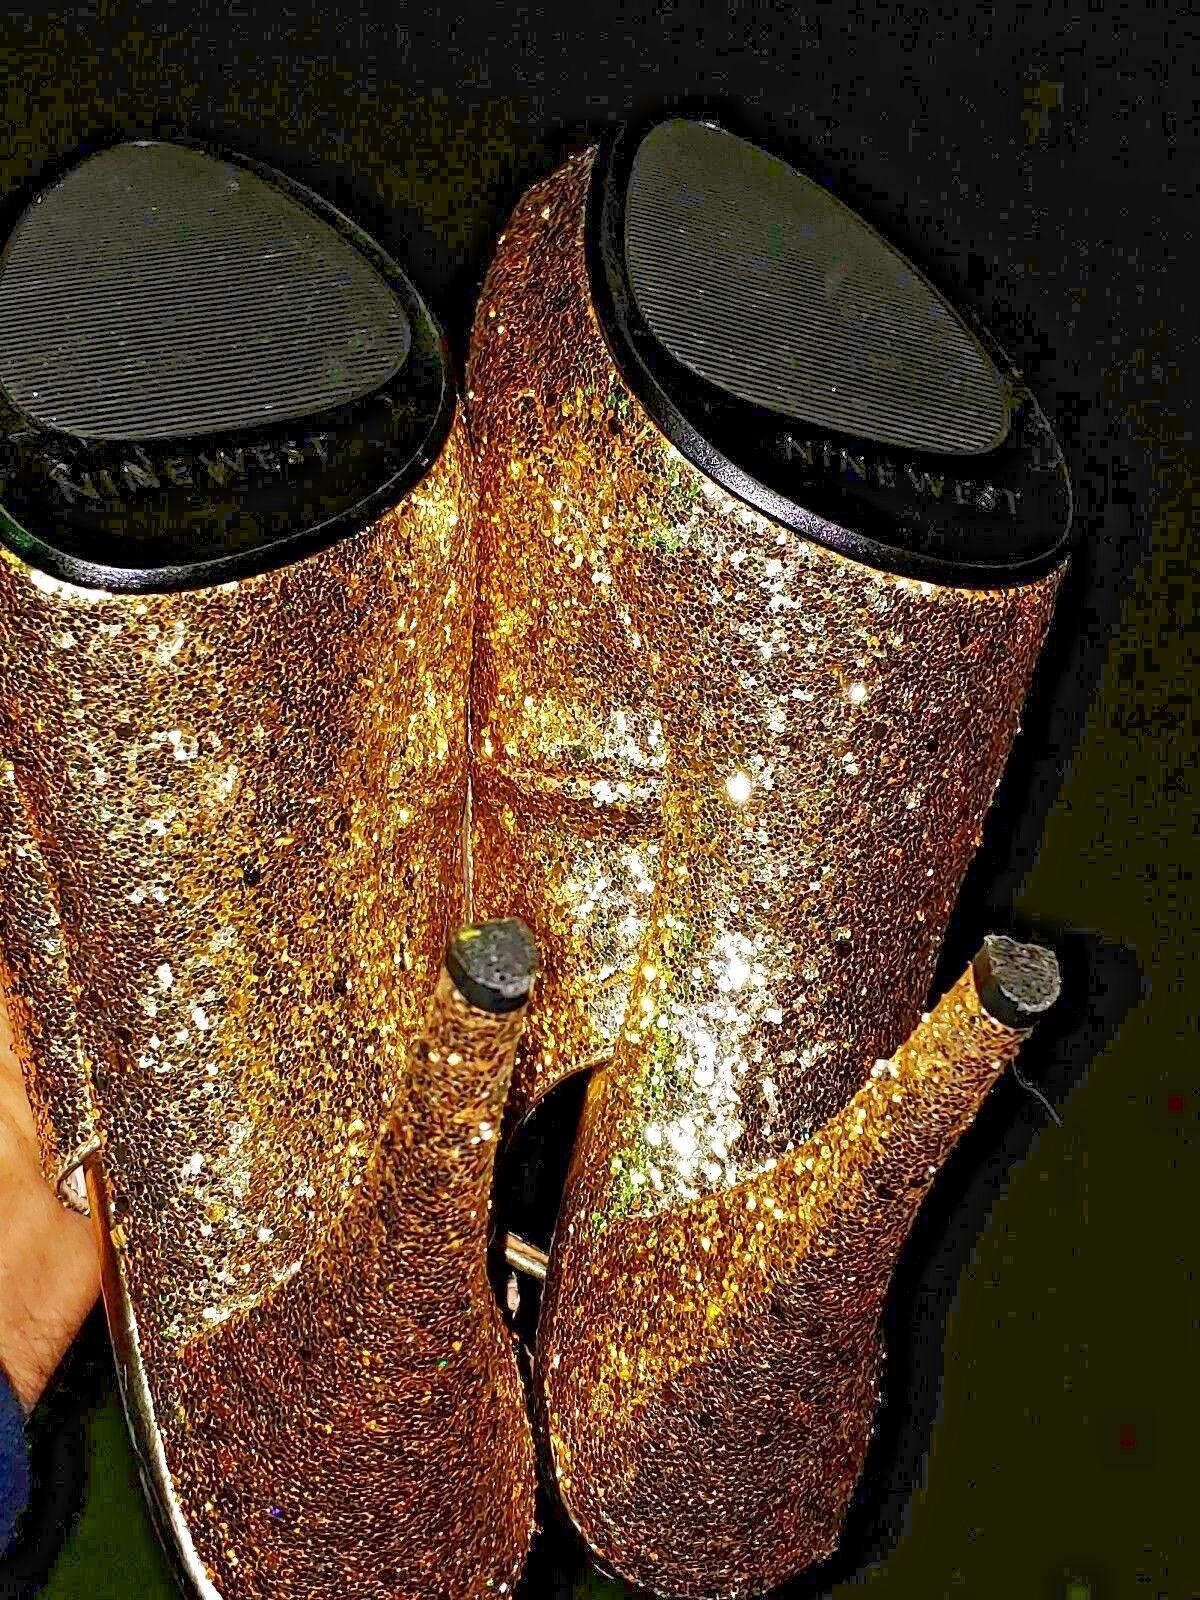 NINE WEST All All All That Glitter is gold Slingbacks High Heels Women shoes Sz 7.5 b4 74a16c